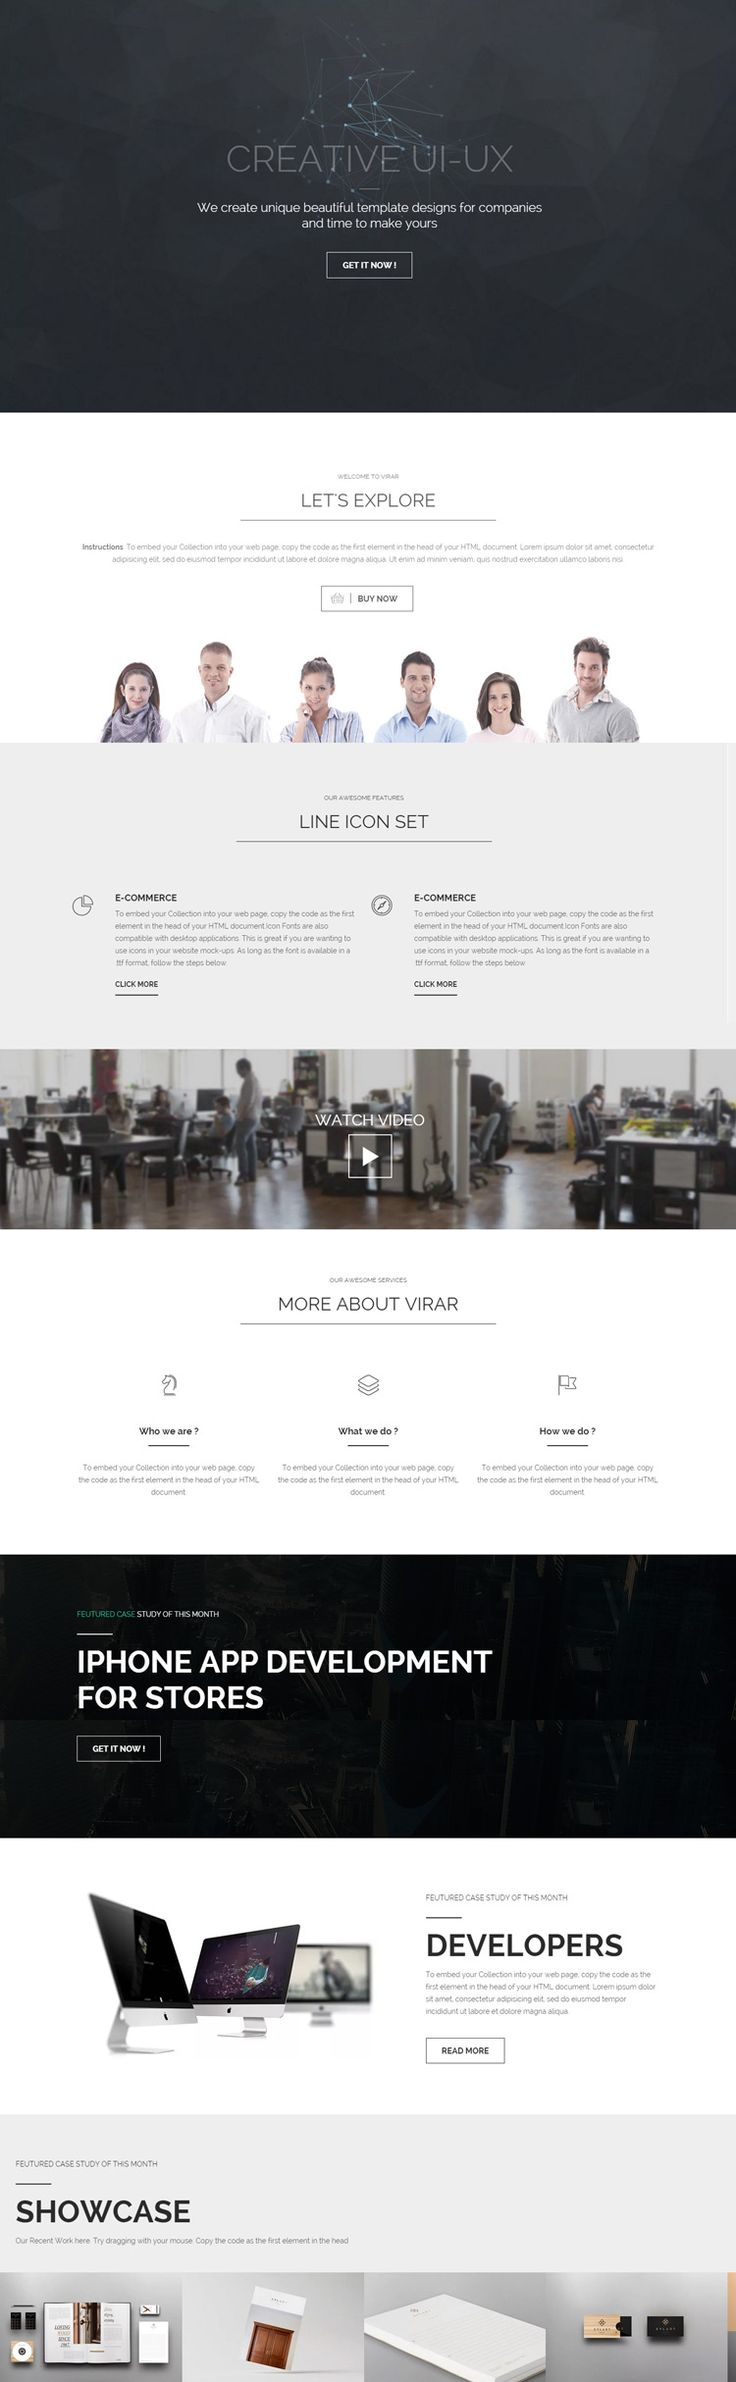 smart header, concept, idea